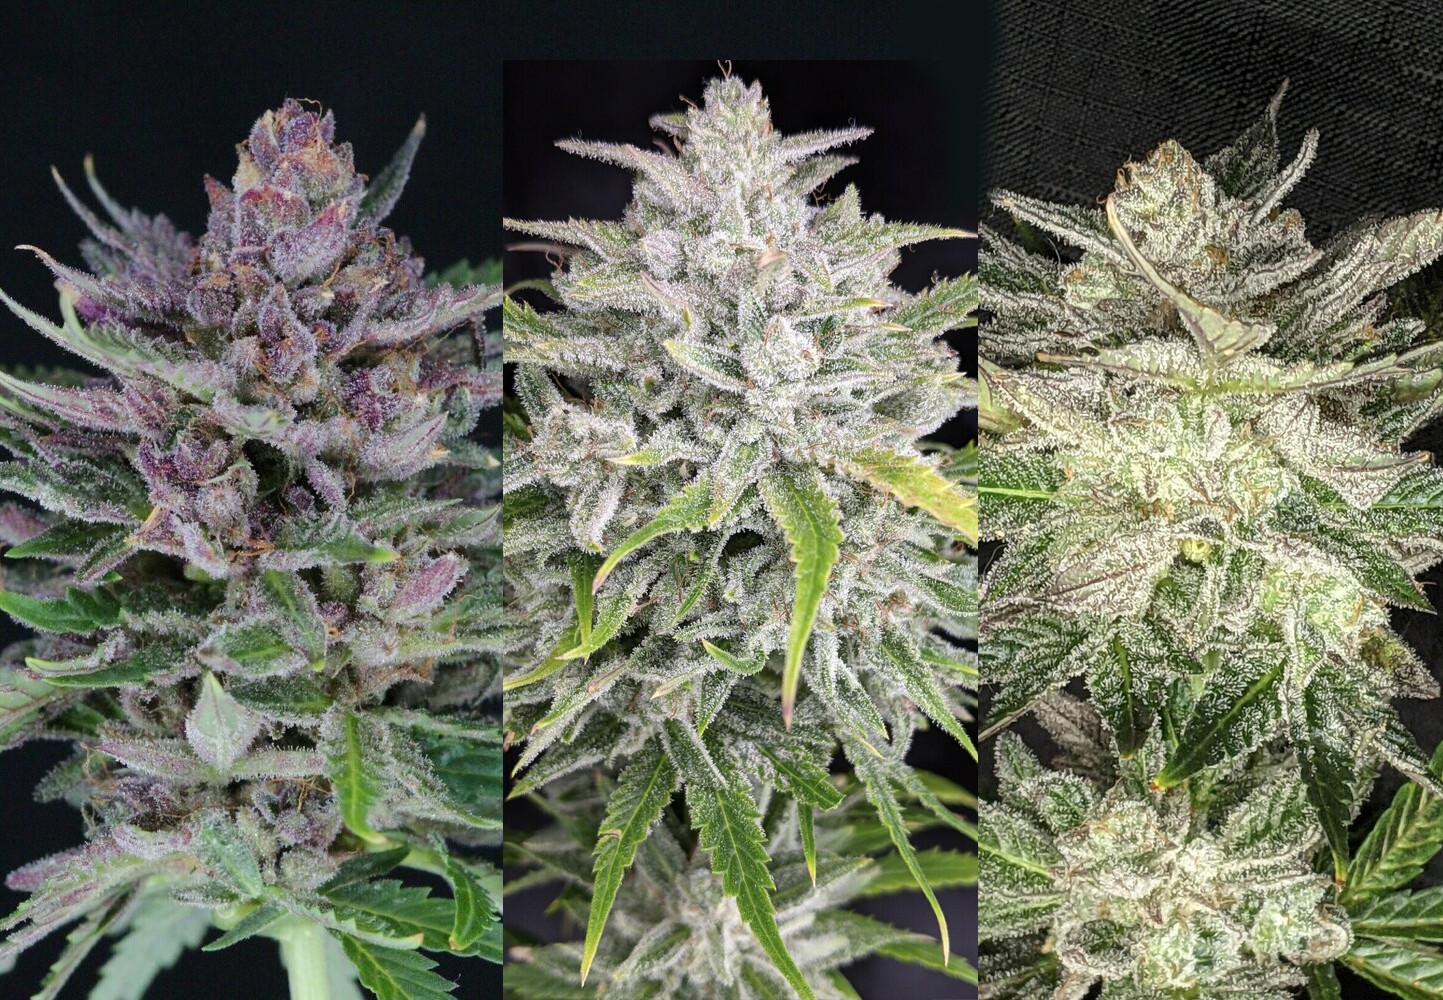 Auto Flower Variety Pack - 3 Strains - Durban Sunrise - Triks - Vidamints - 9 Auto Fem Seeds (3 Seeds Each) - Twenty20 Mendocino